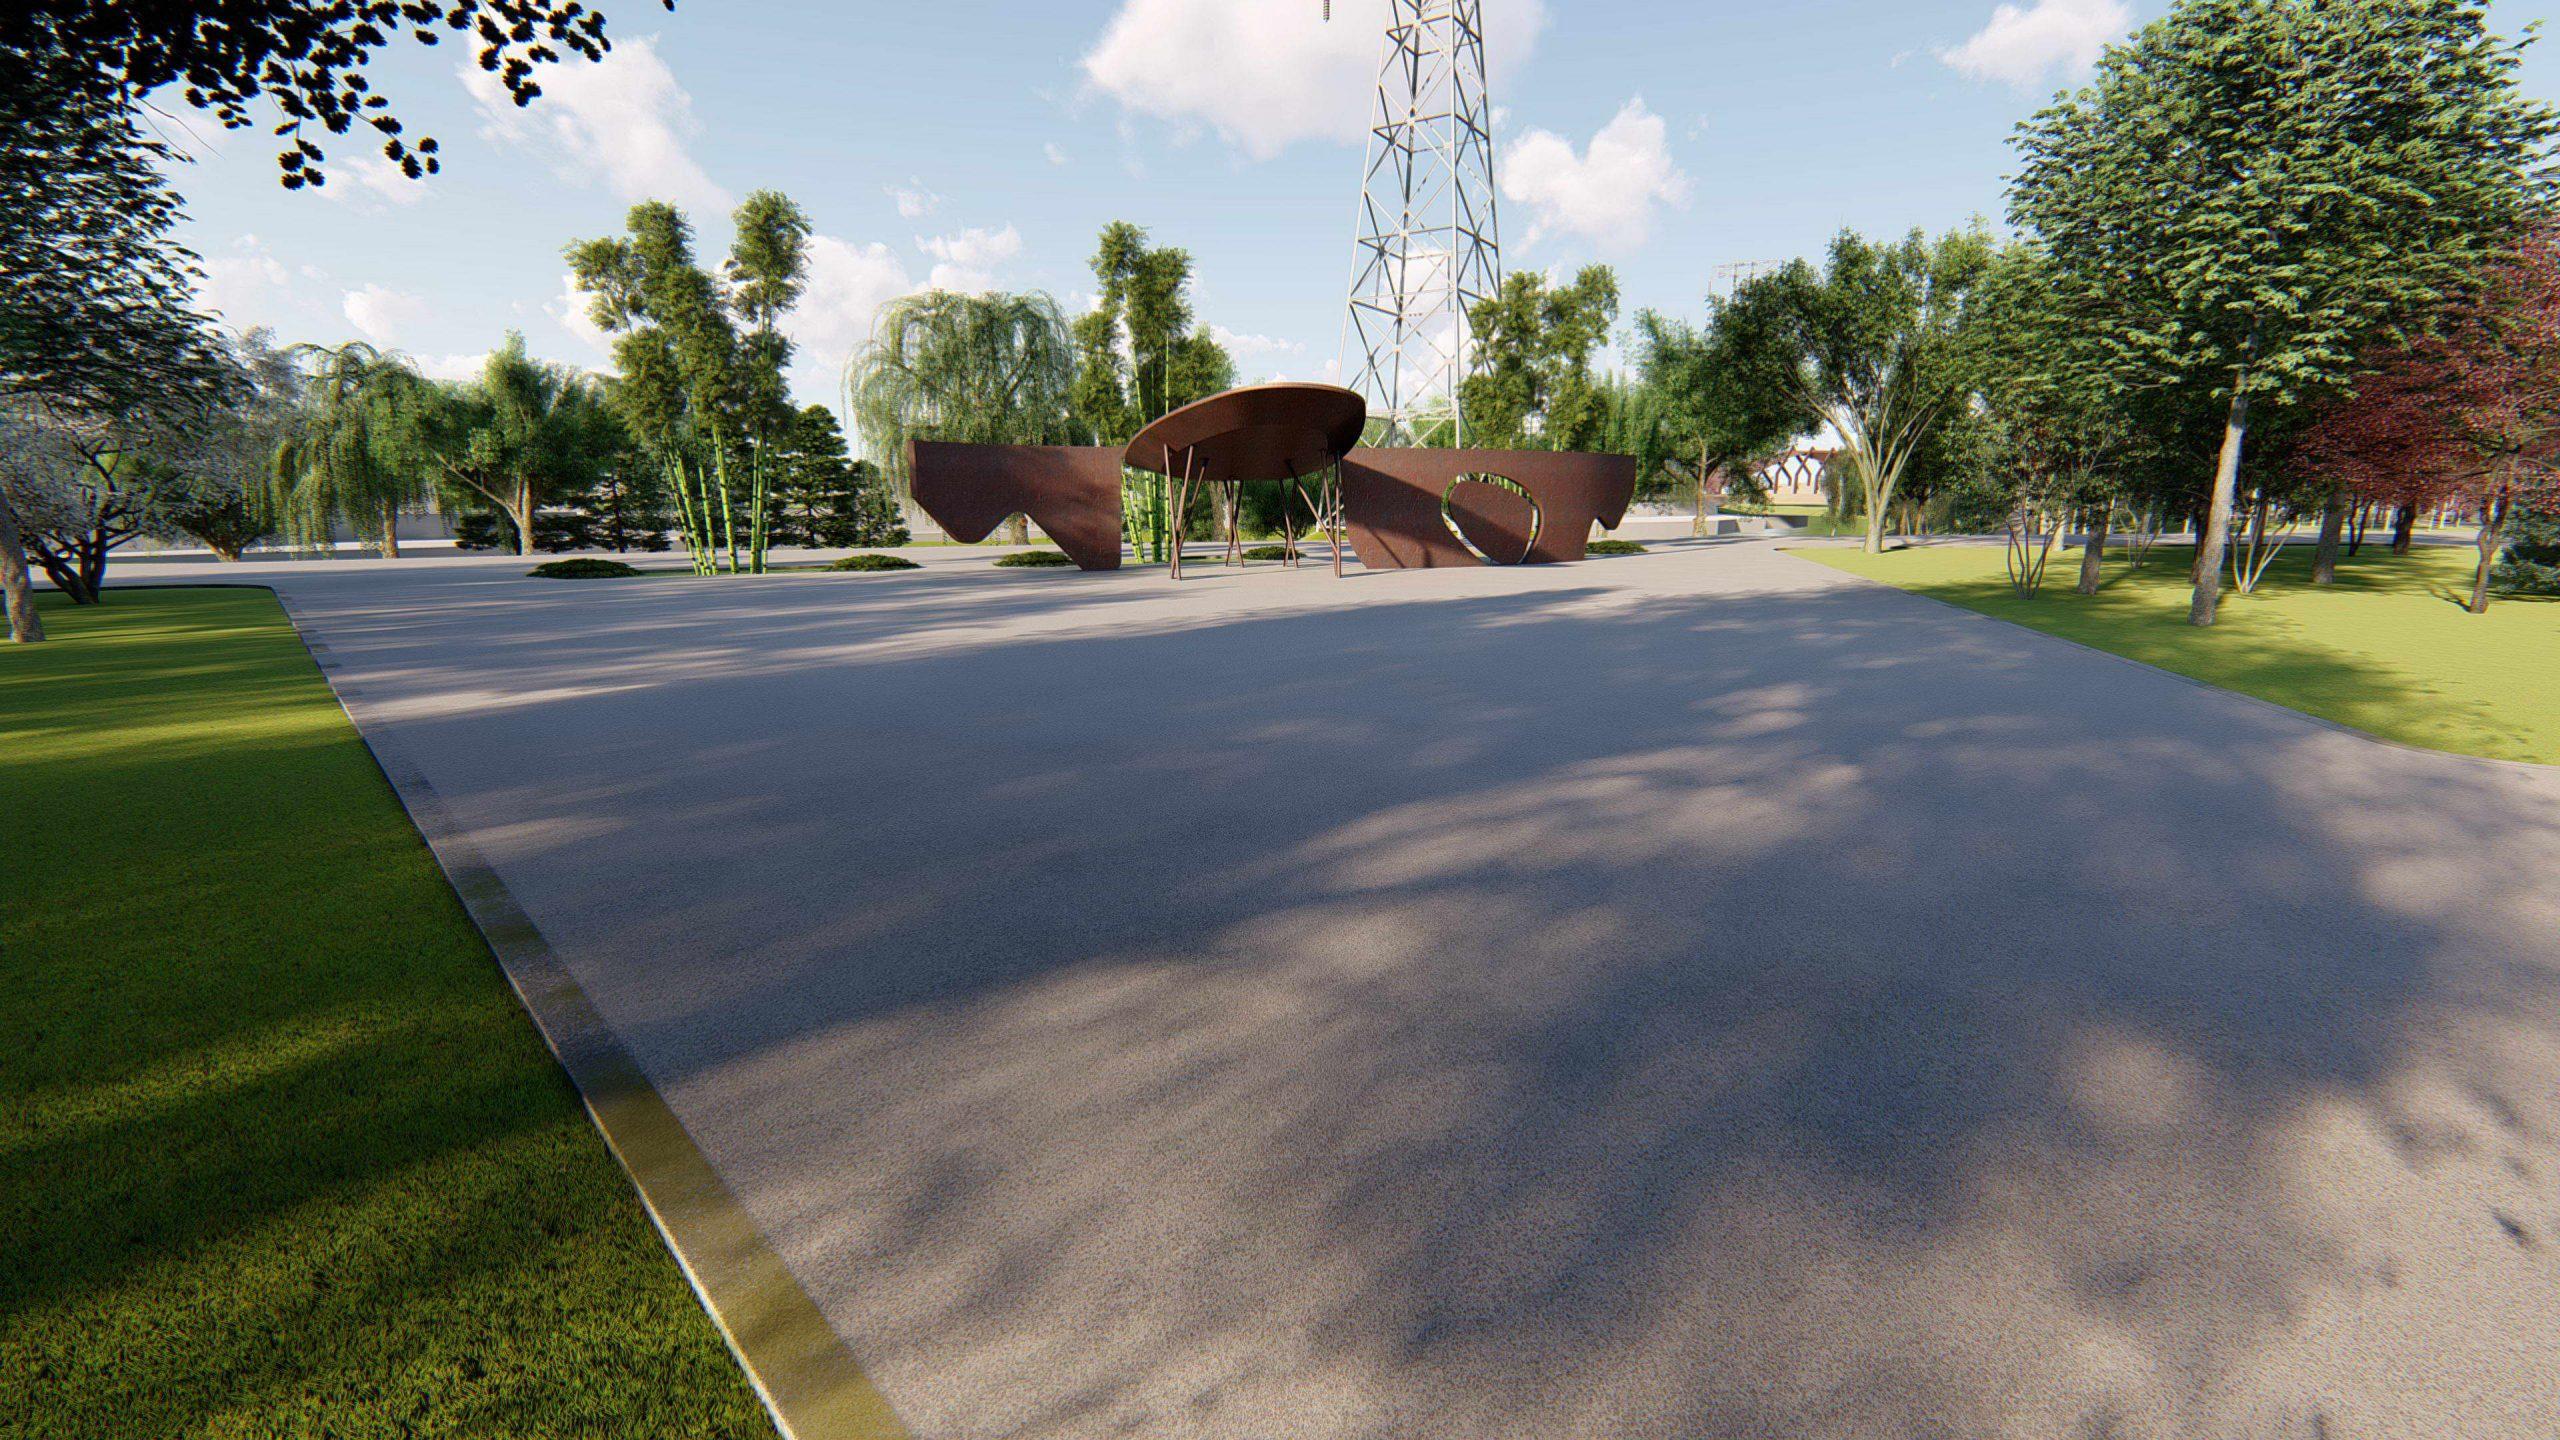 https://nbc-arhitect.ro/wp-content/uploads/2020/10/NBC-Arhitect-_-contests-_-Kinetik-Park-_-Cluj-Napoca-Romania_16-scaled.jpg